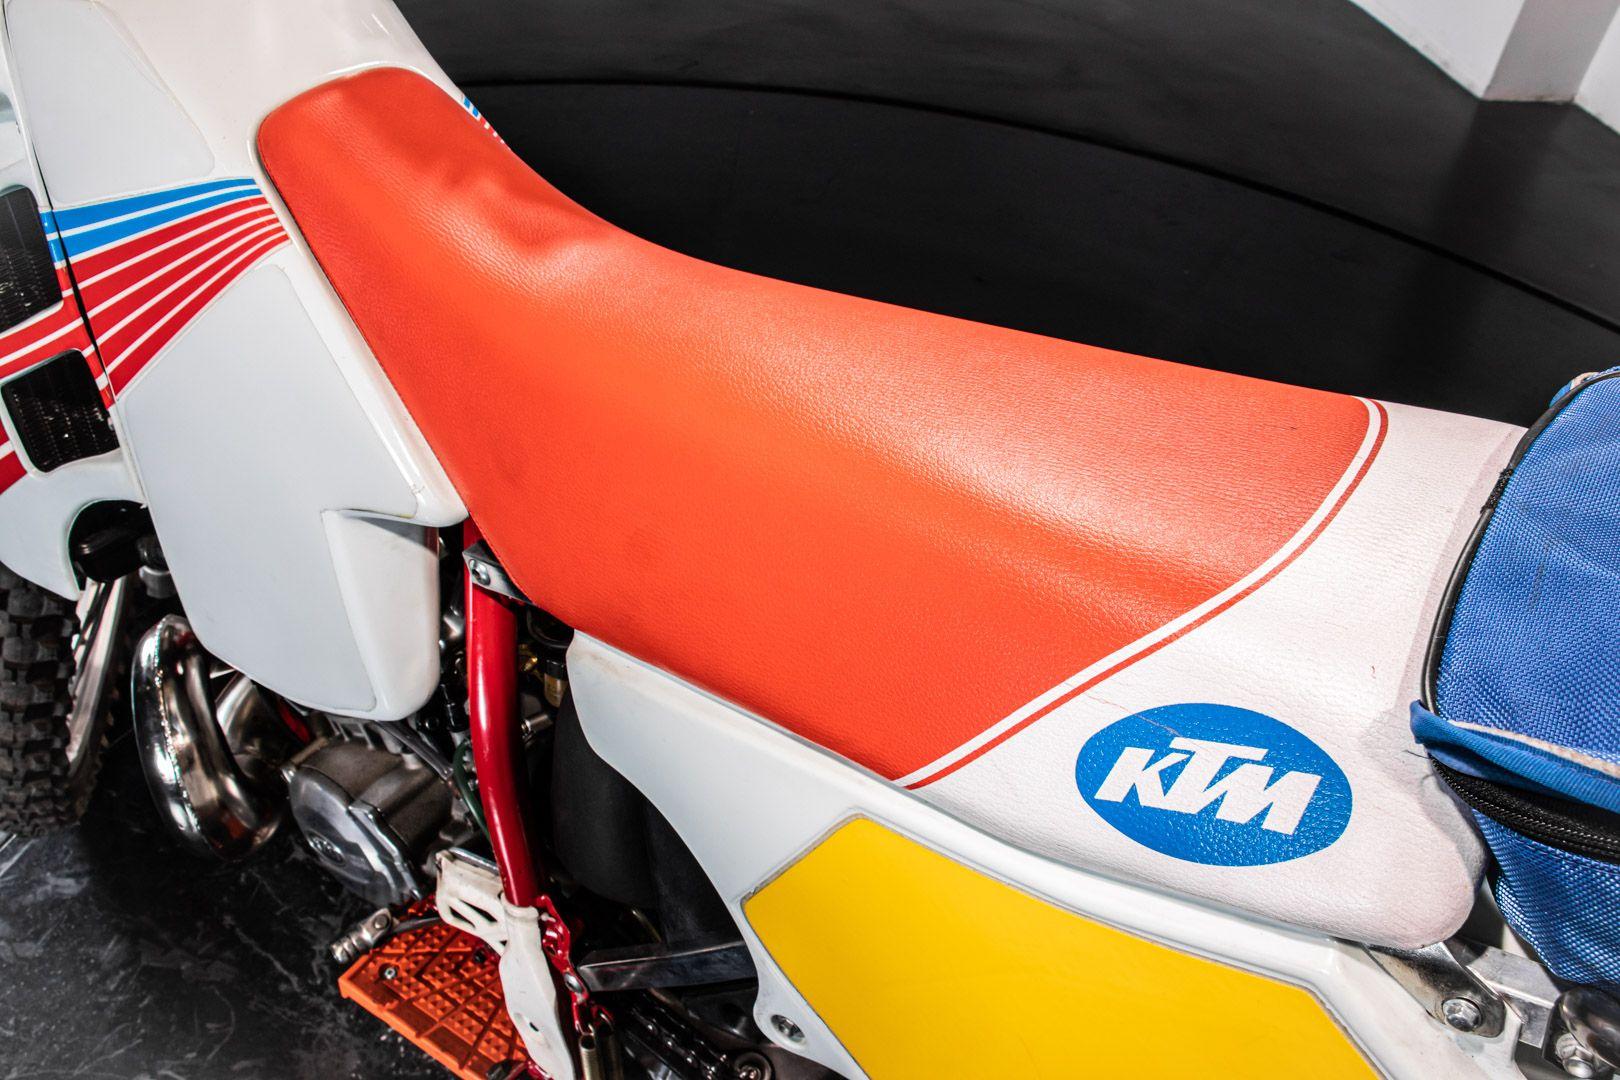 1991 KTM GS 250 82486